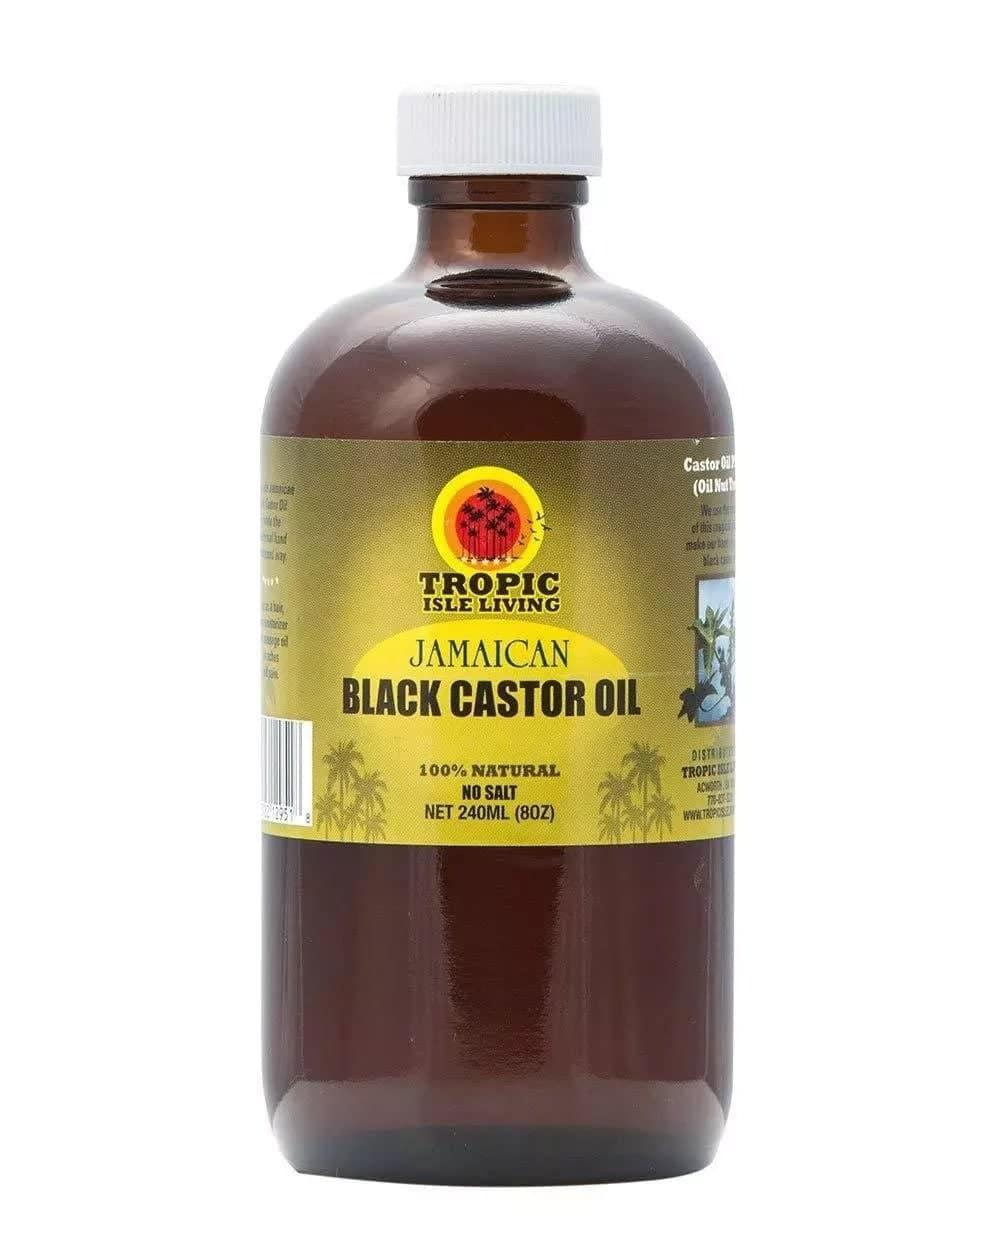 Jamaican black castor oil Black Jamaican castor oil Jamaican black castor oil benefits